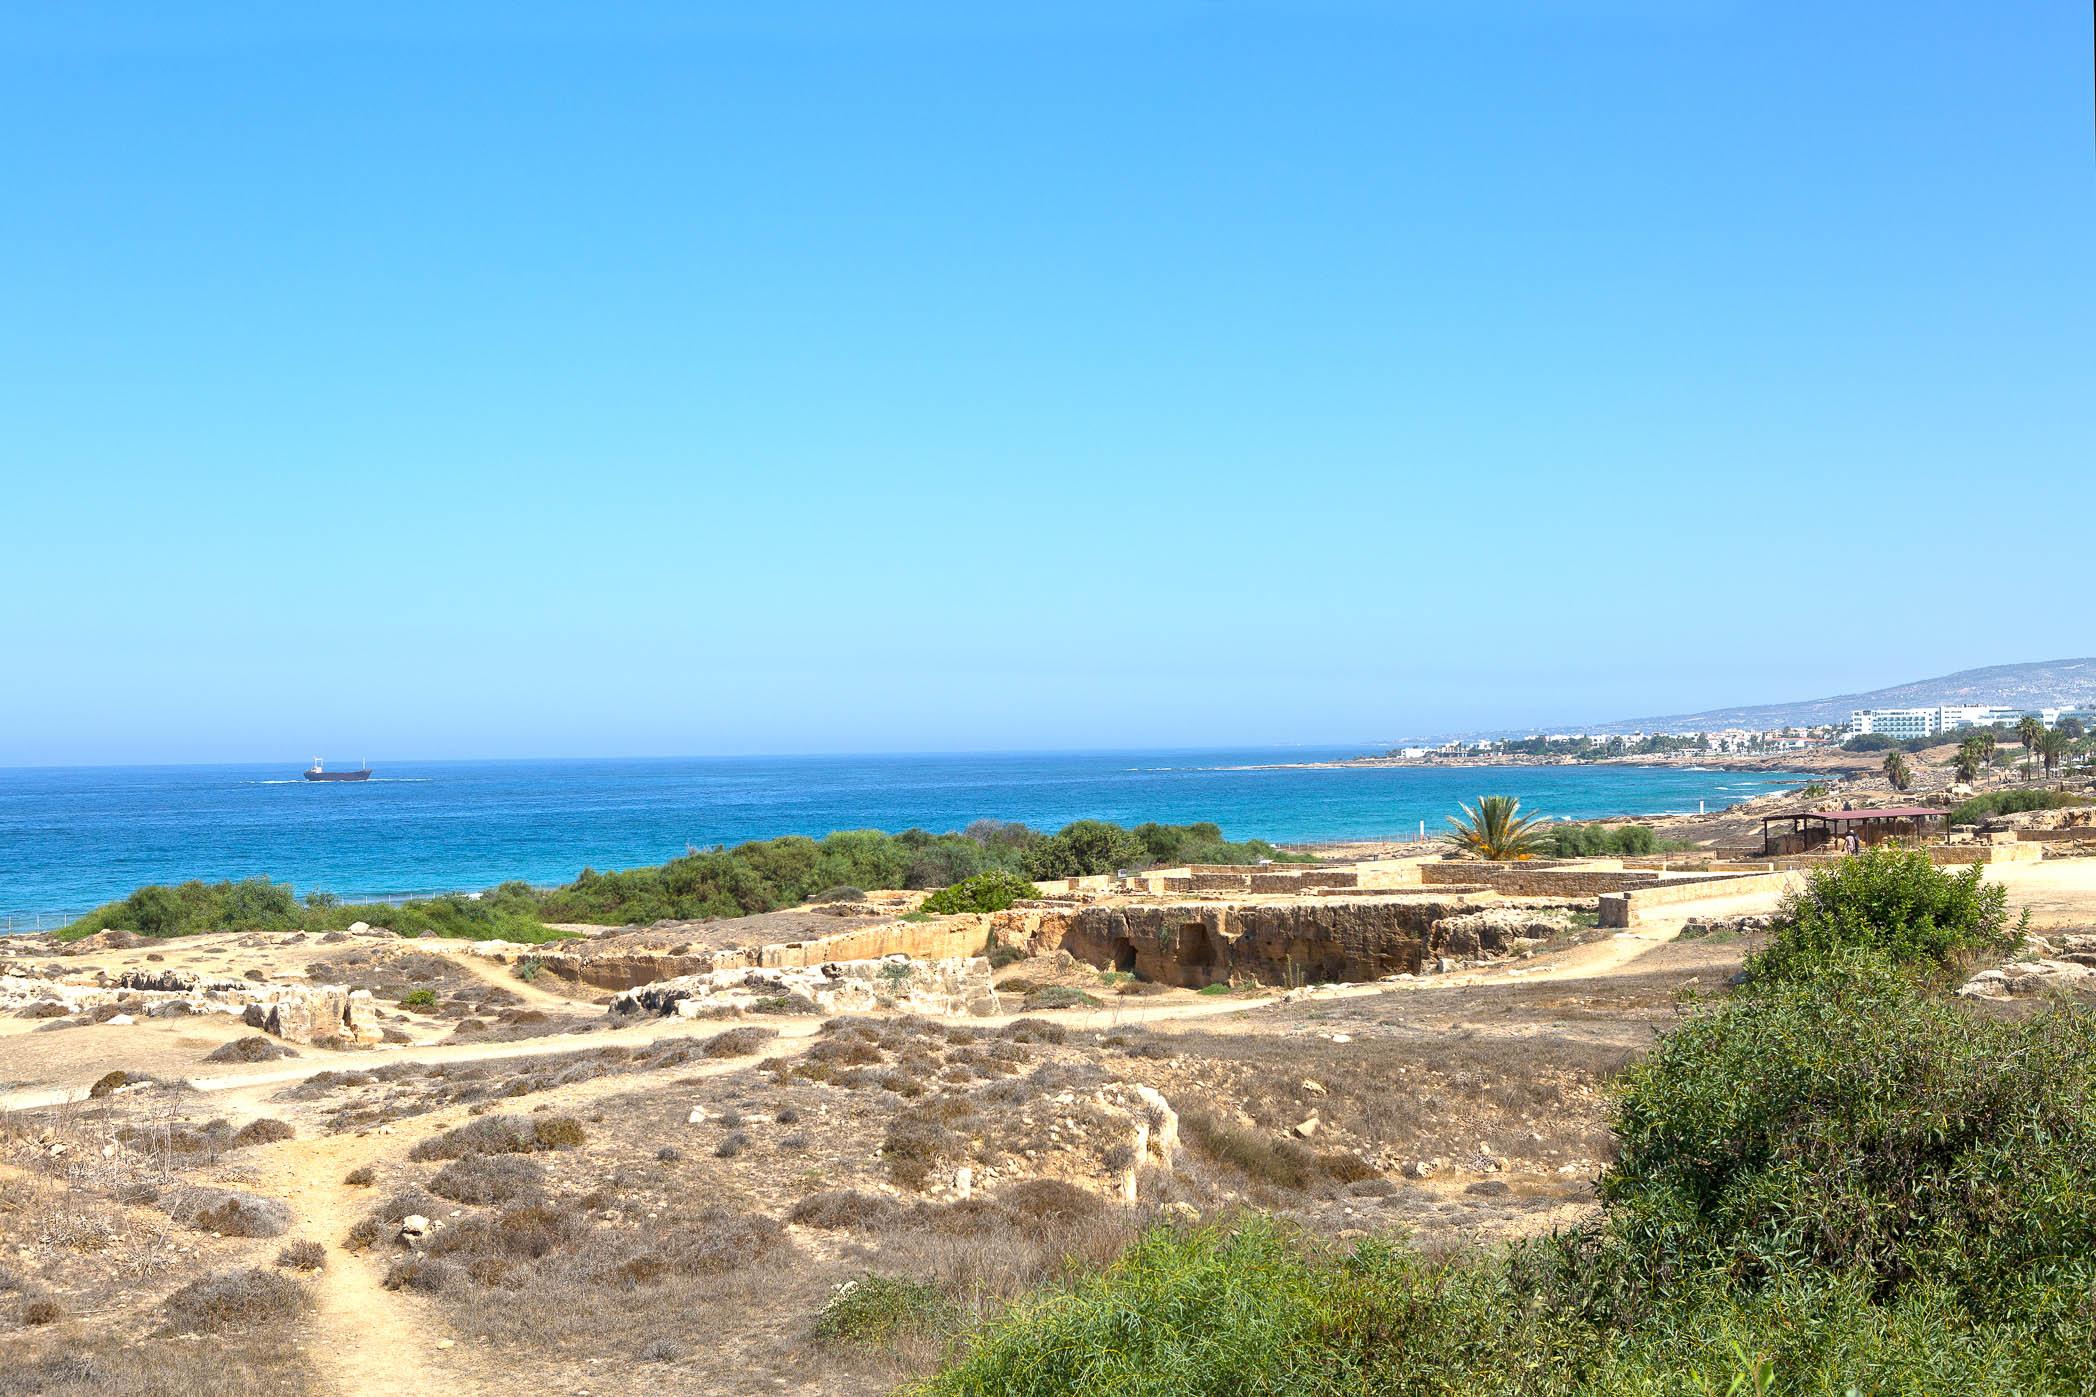 Tombs of the Kings in Paphos ,Cyprus